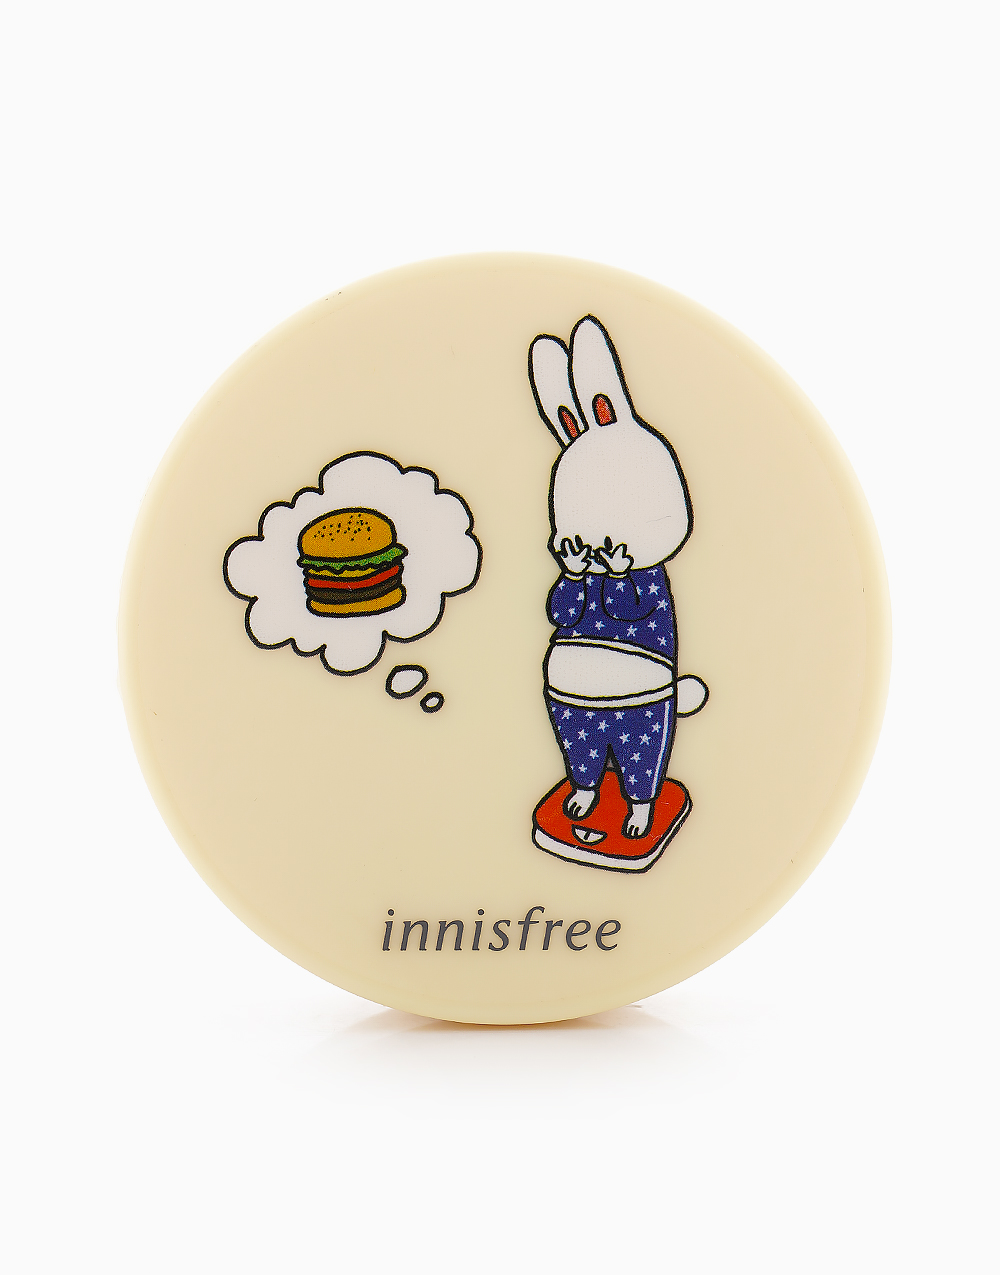 No Sebum Mineral Powder Happy Bunny Edition (5g) by Innisfree | #3 No Pain, No Gain